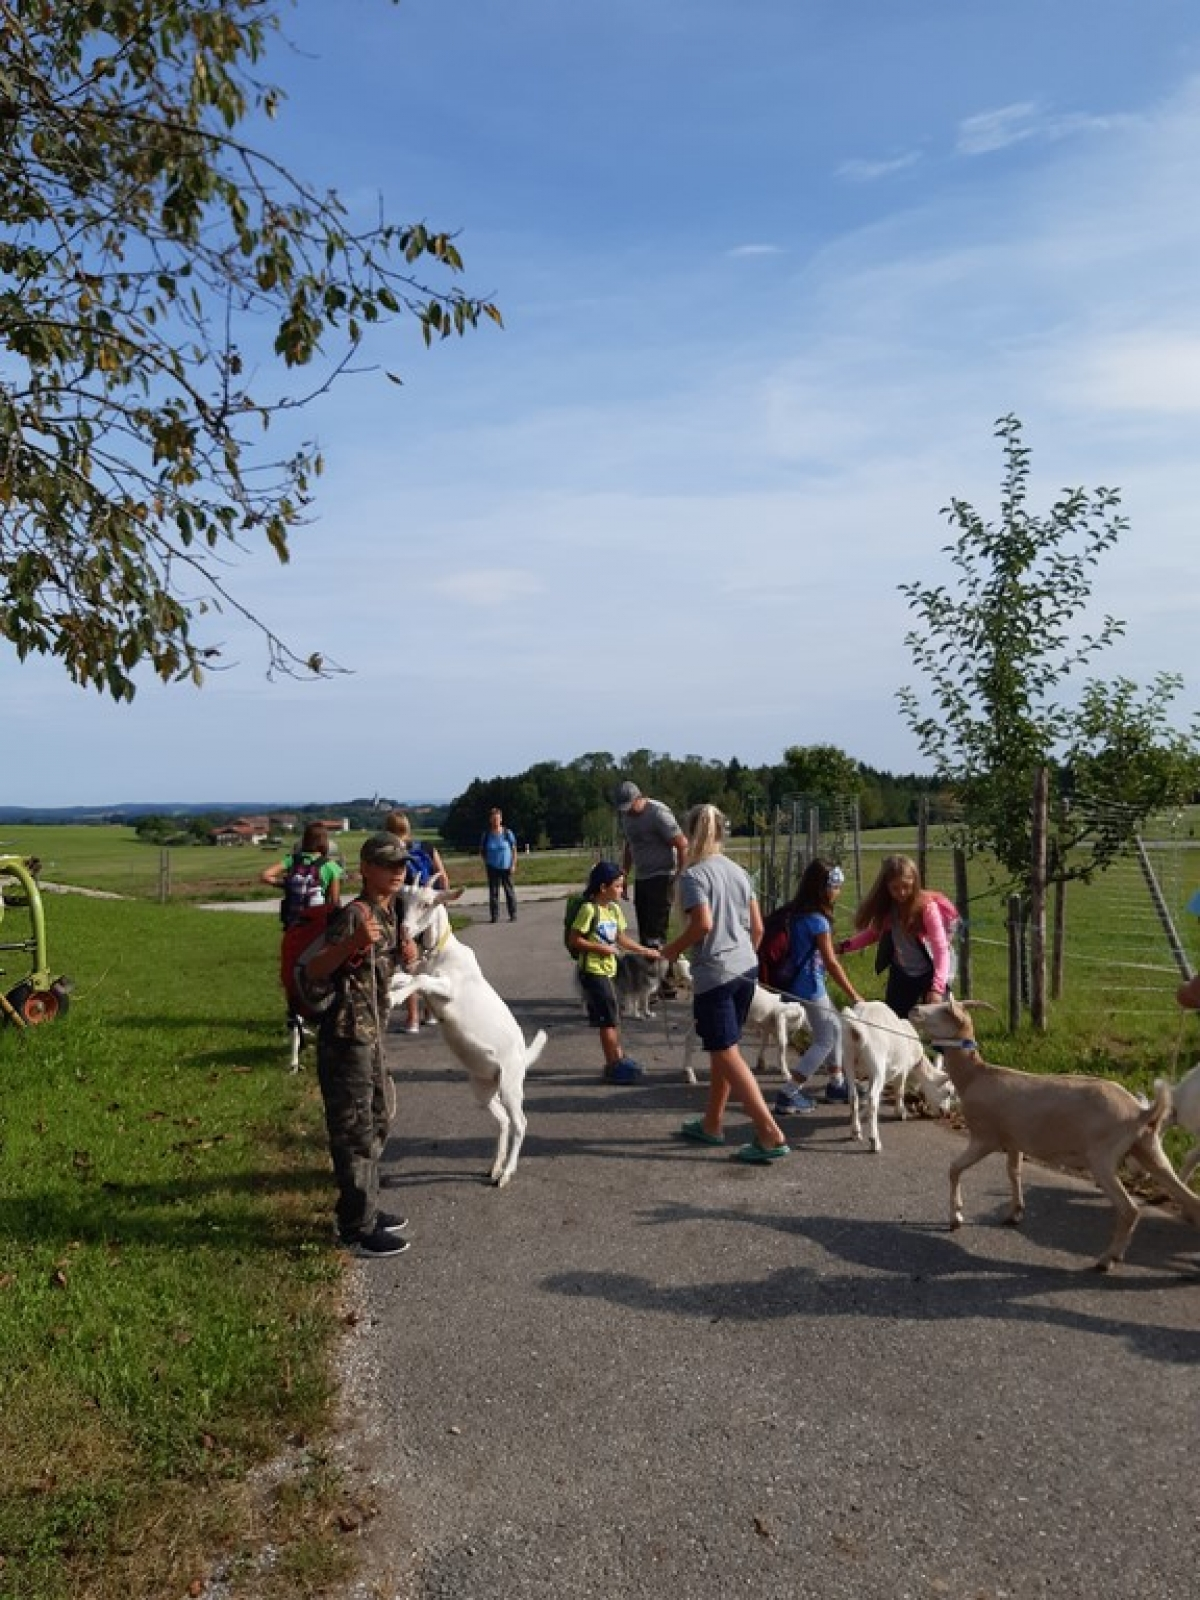 Ferienprogramm des Sportvereins Wonneberg